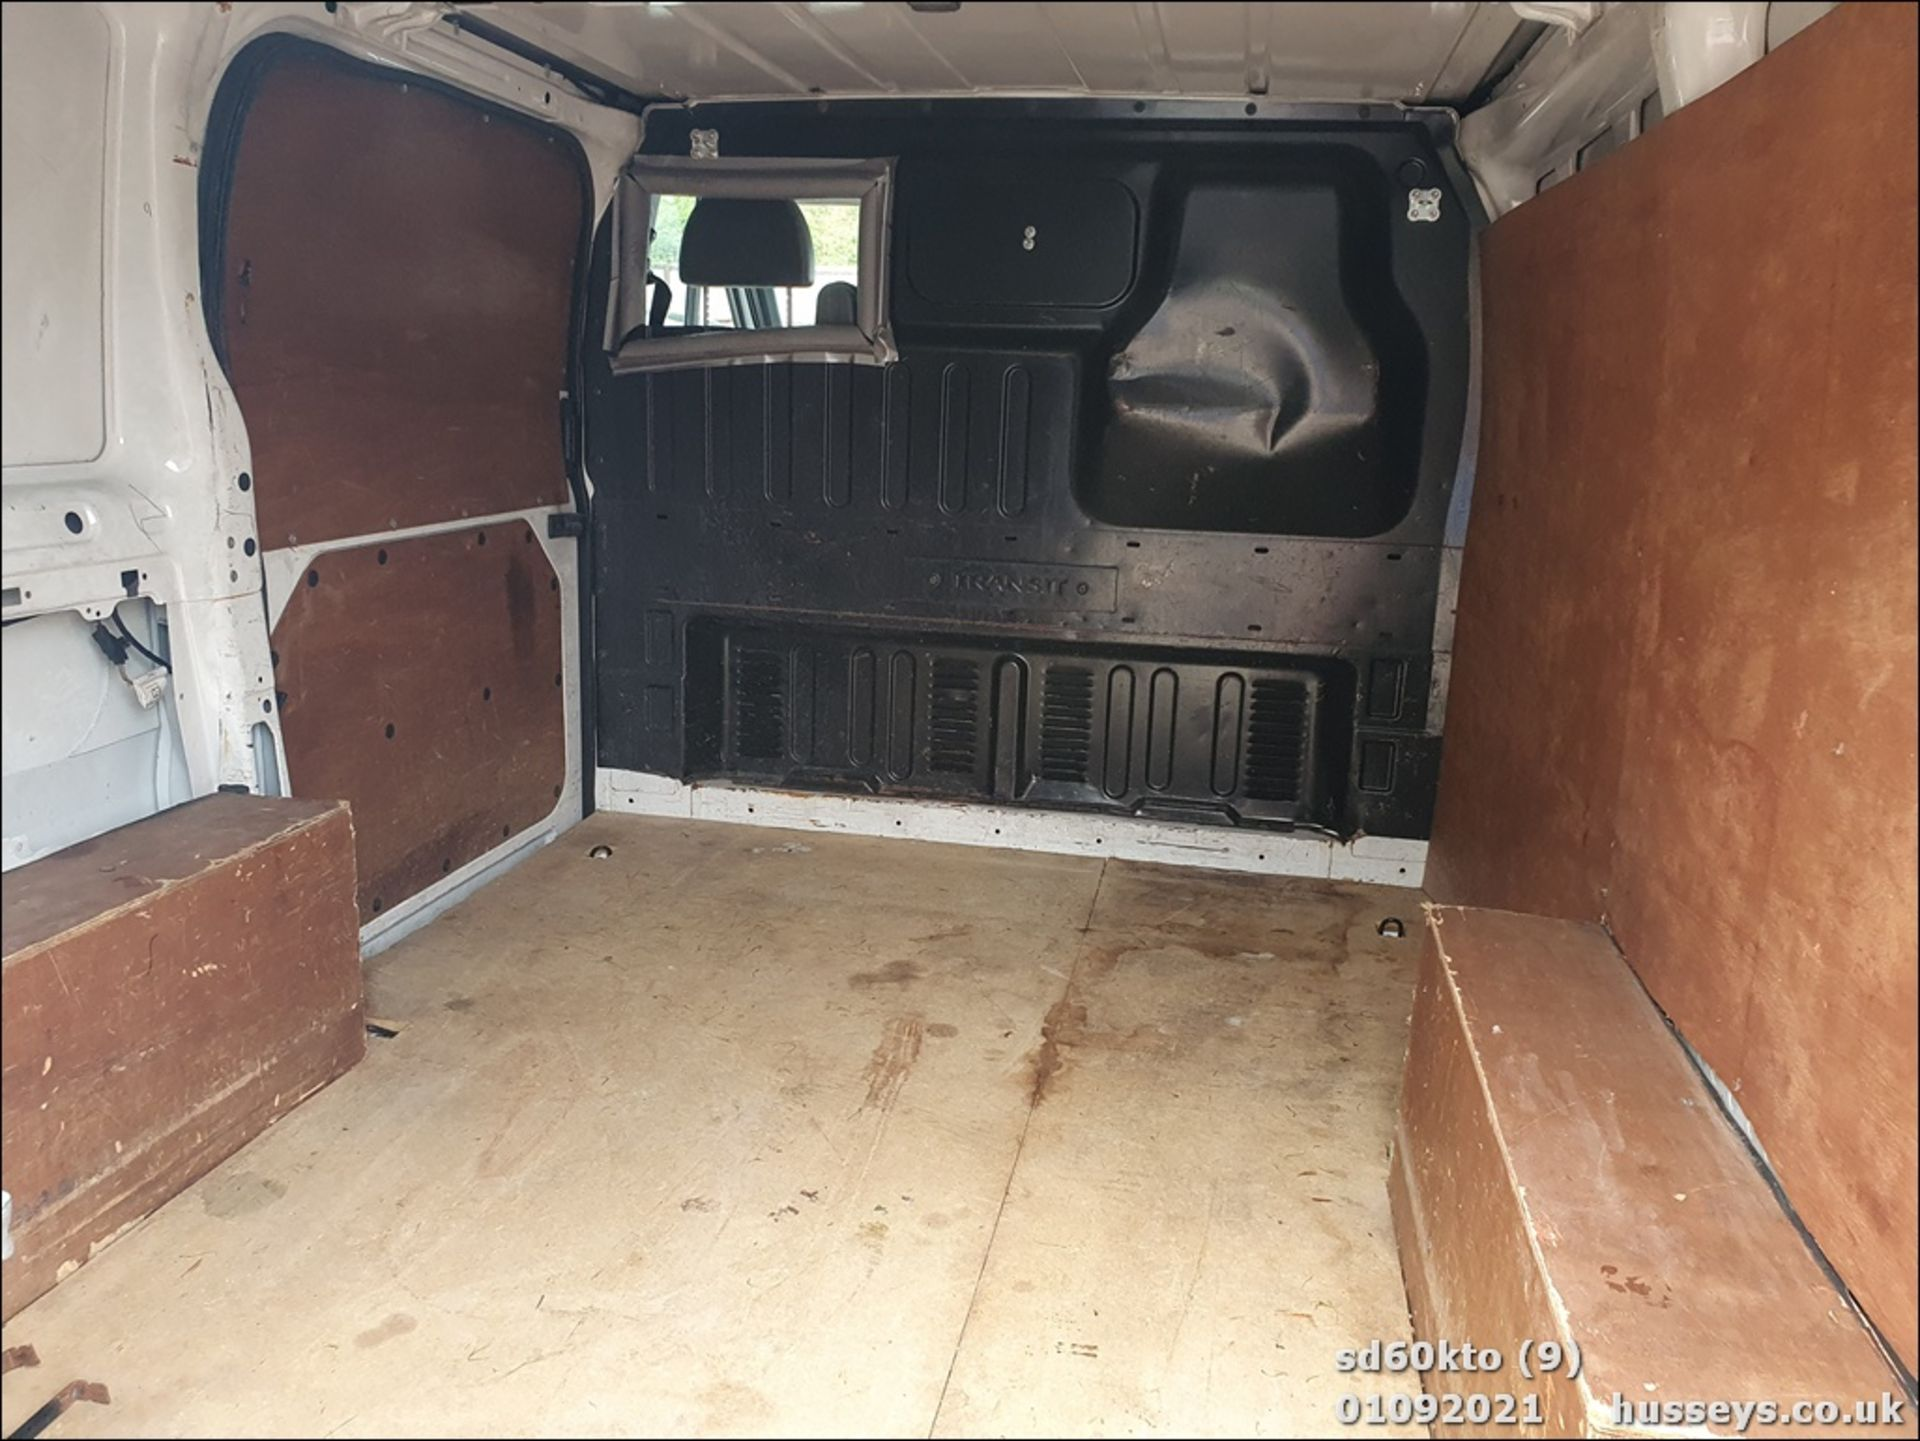 10/60 FORD TRANSIT 85 T260M FWD - 2198cc 5dr Van (White, 237k) - Image 18 of 23